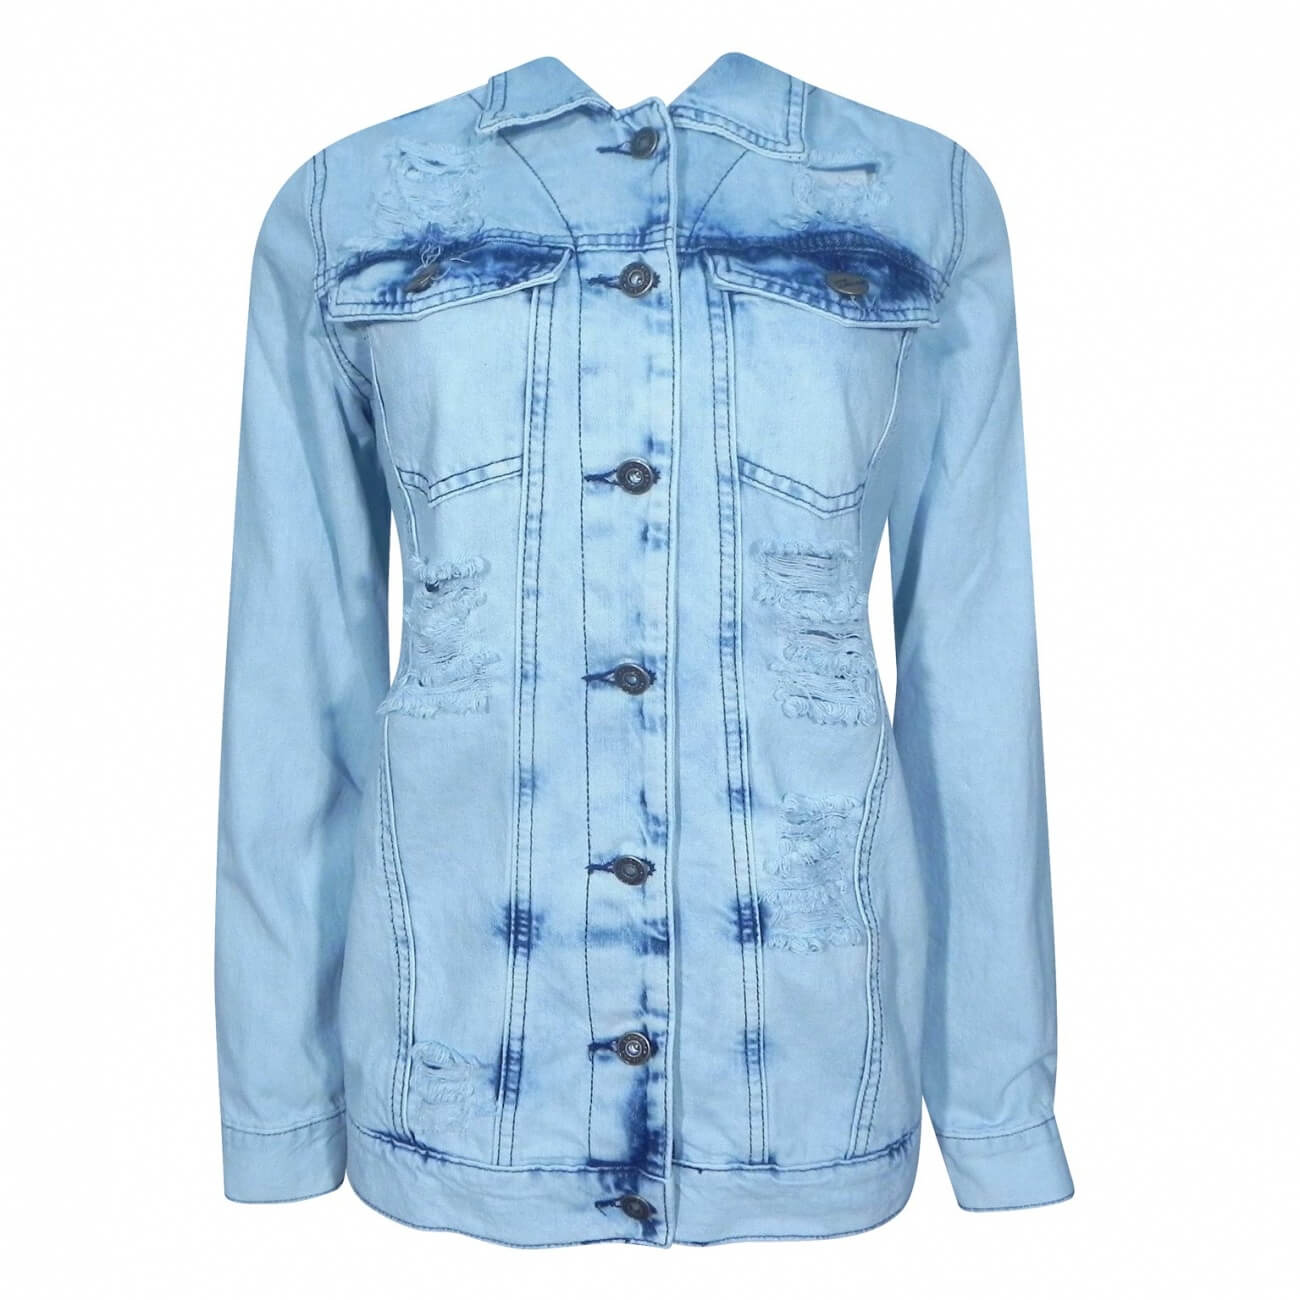 6219c5e13 Jaqueta Jeans Maxi Destroyd Lady Rock - Pole Modas